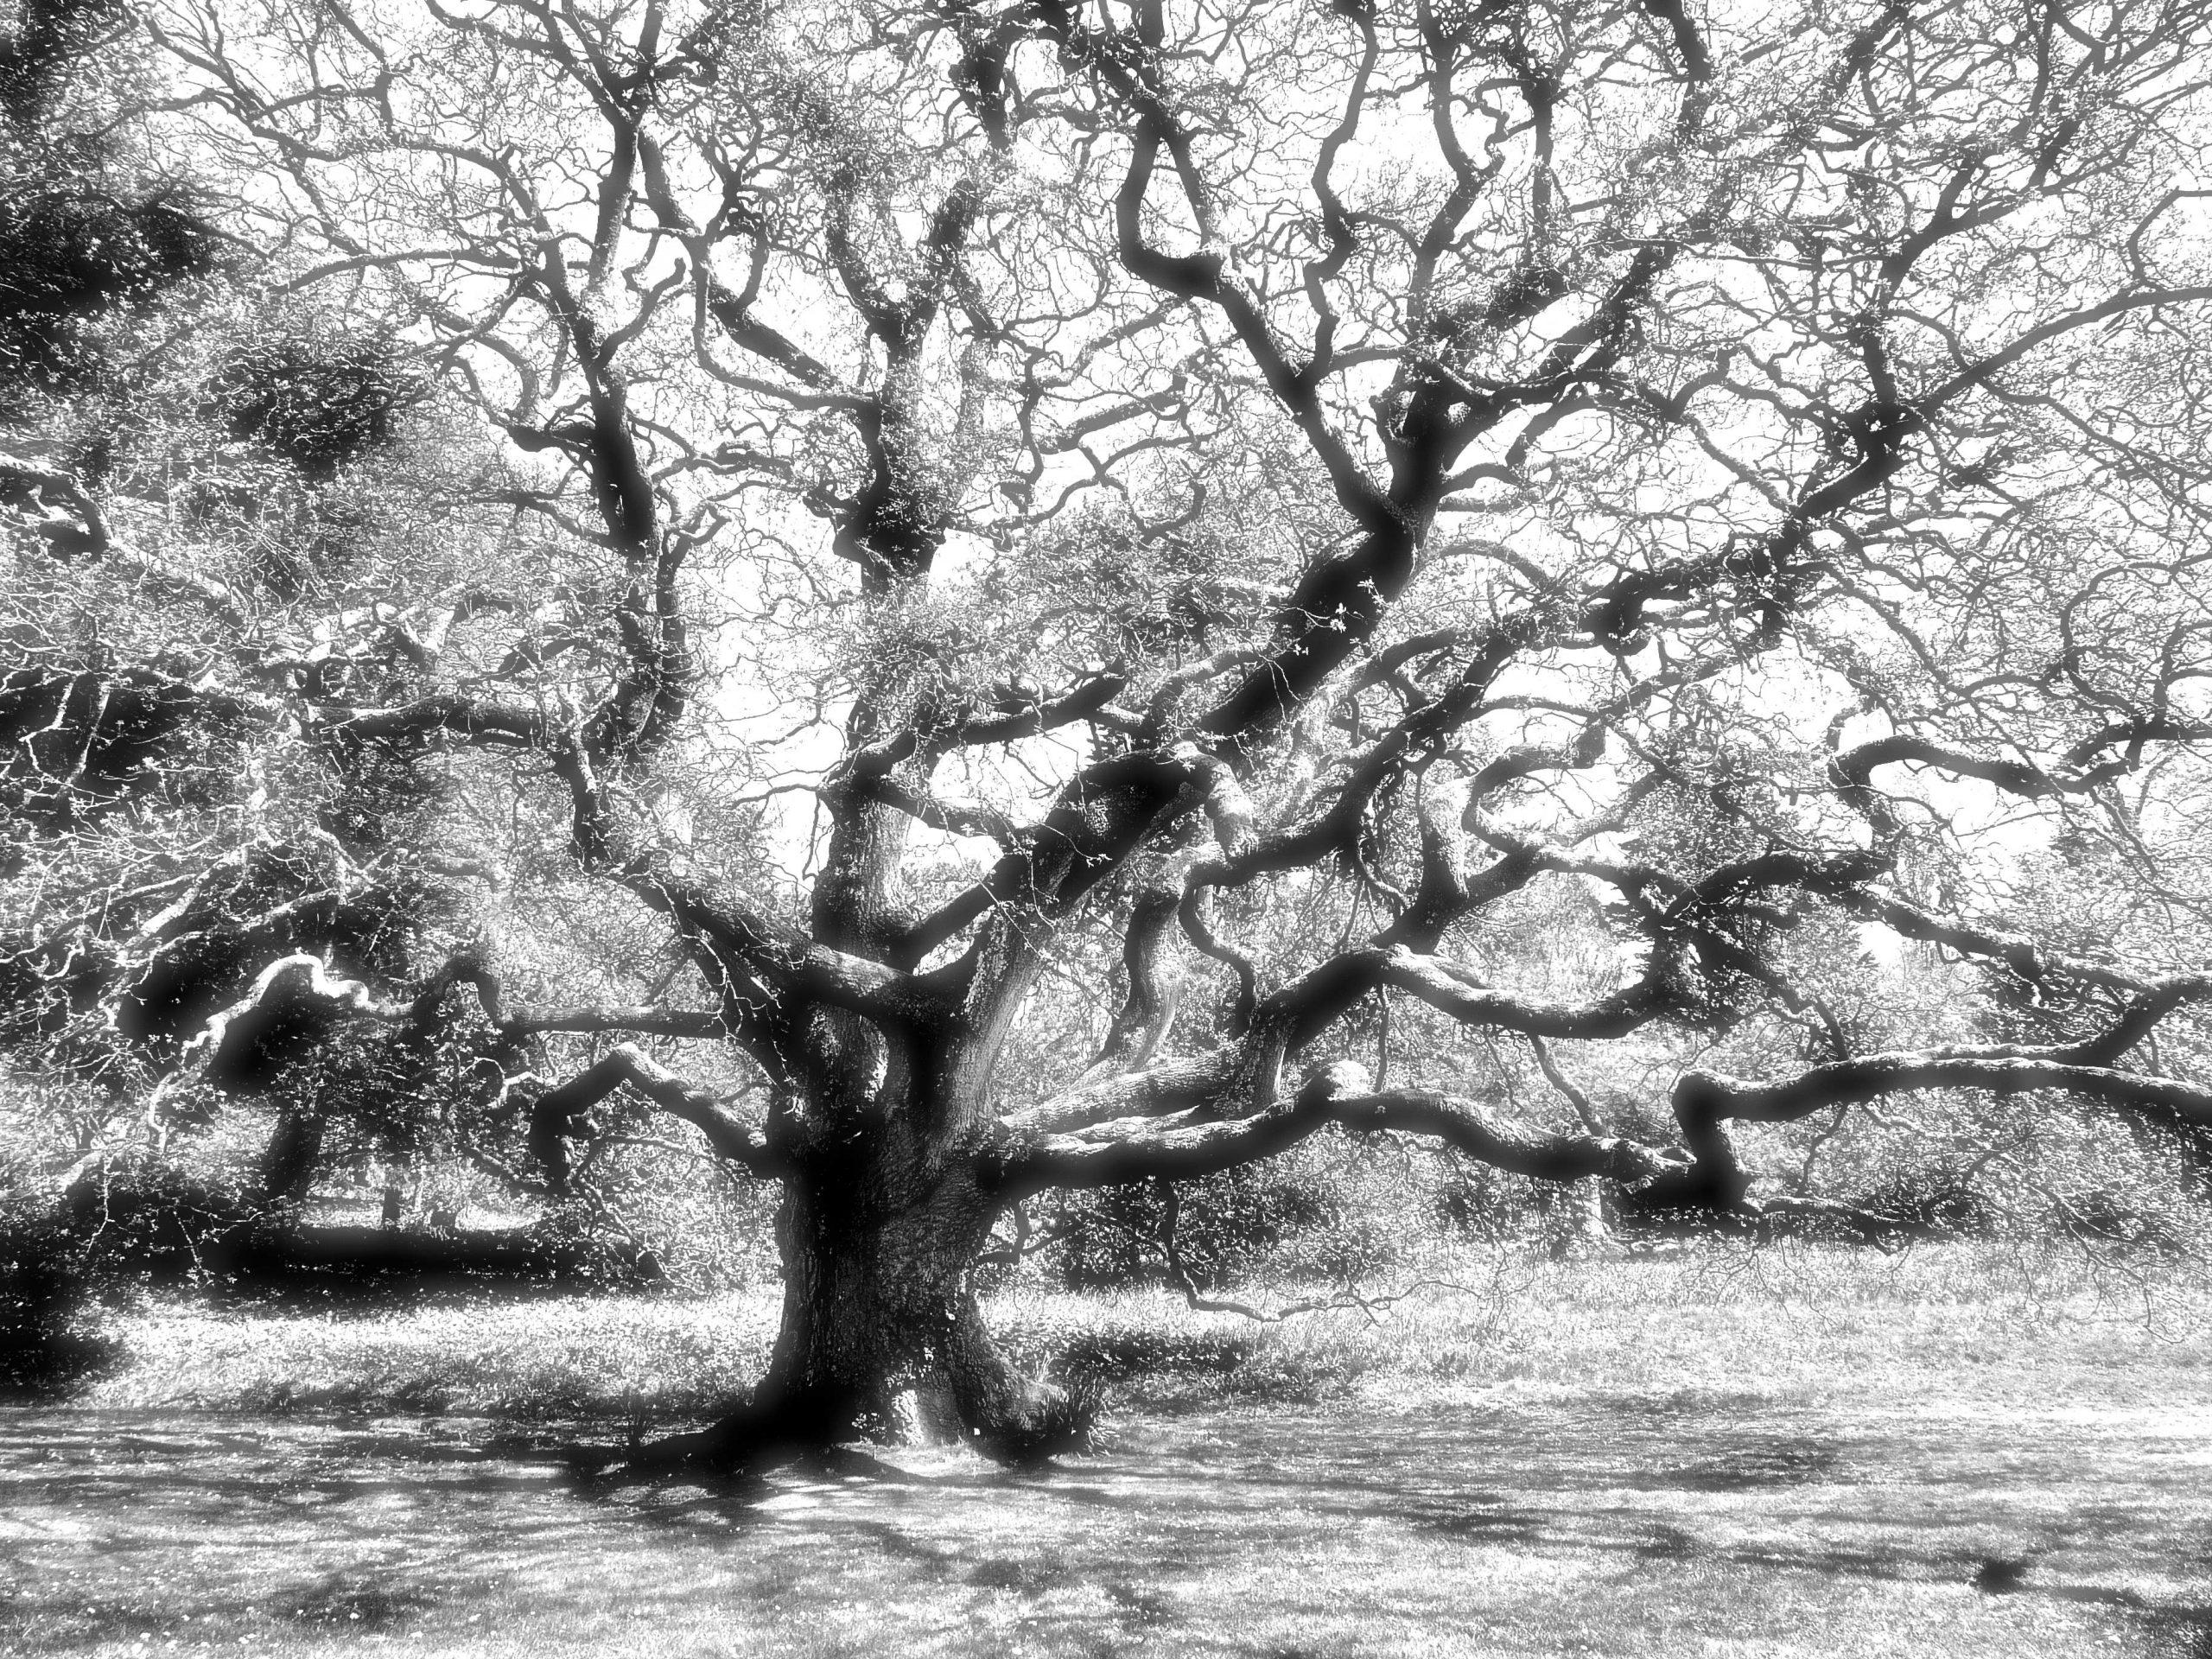 Wychwood, The Tree, Old Oak, ghosts, eerie, spooky